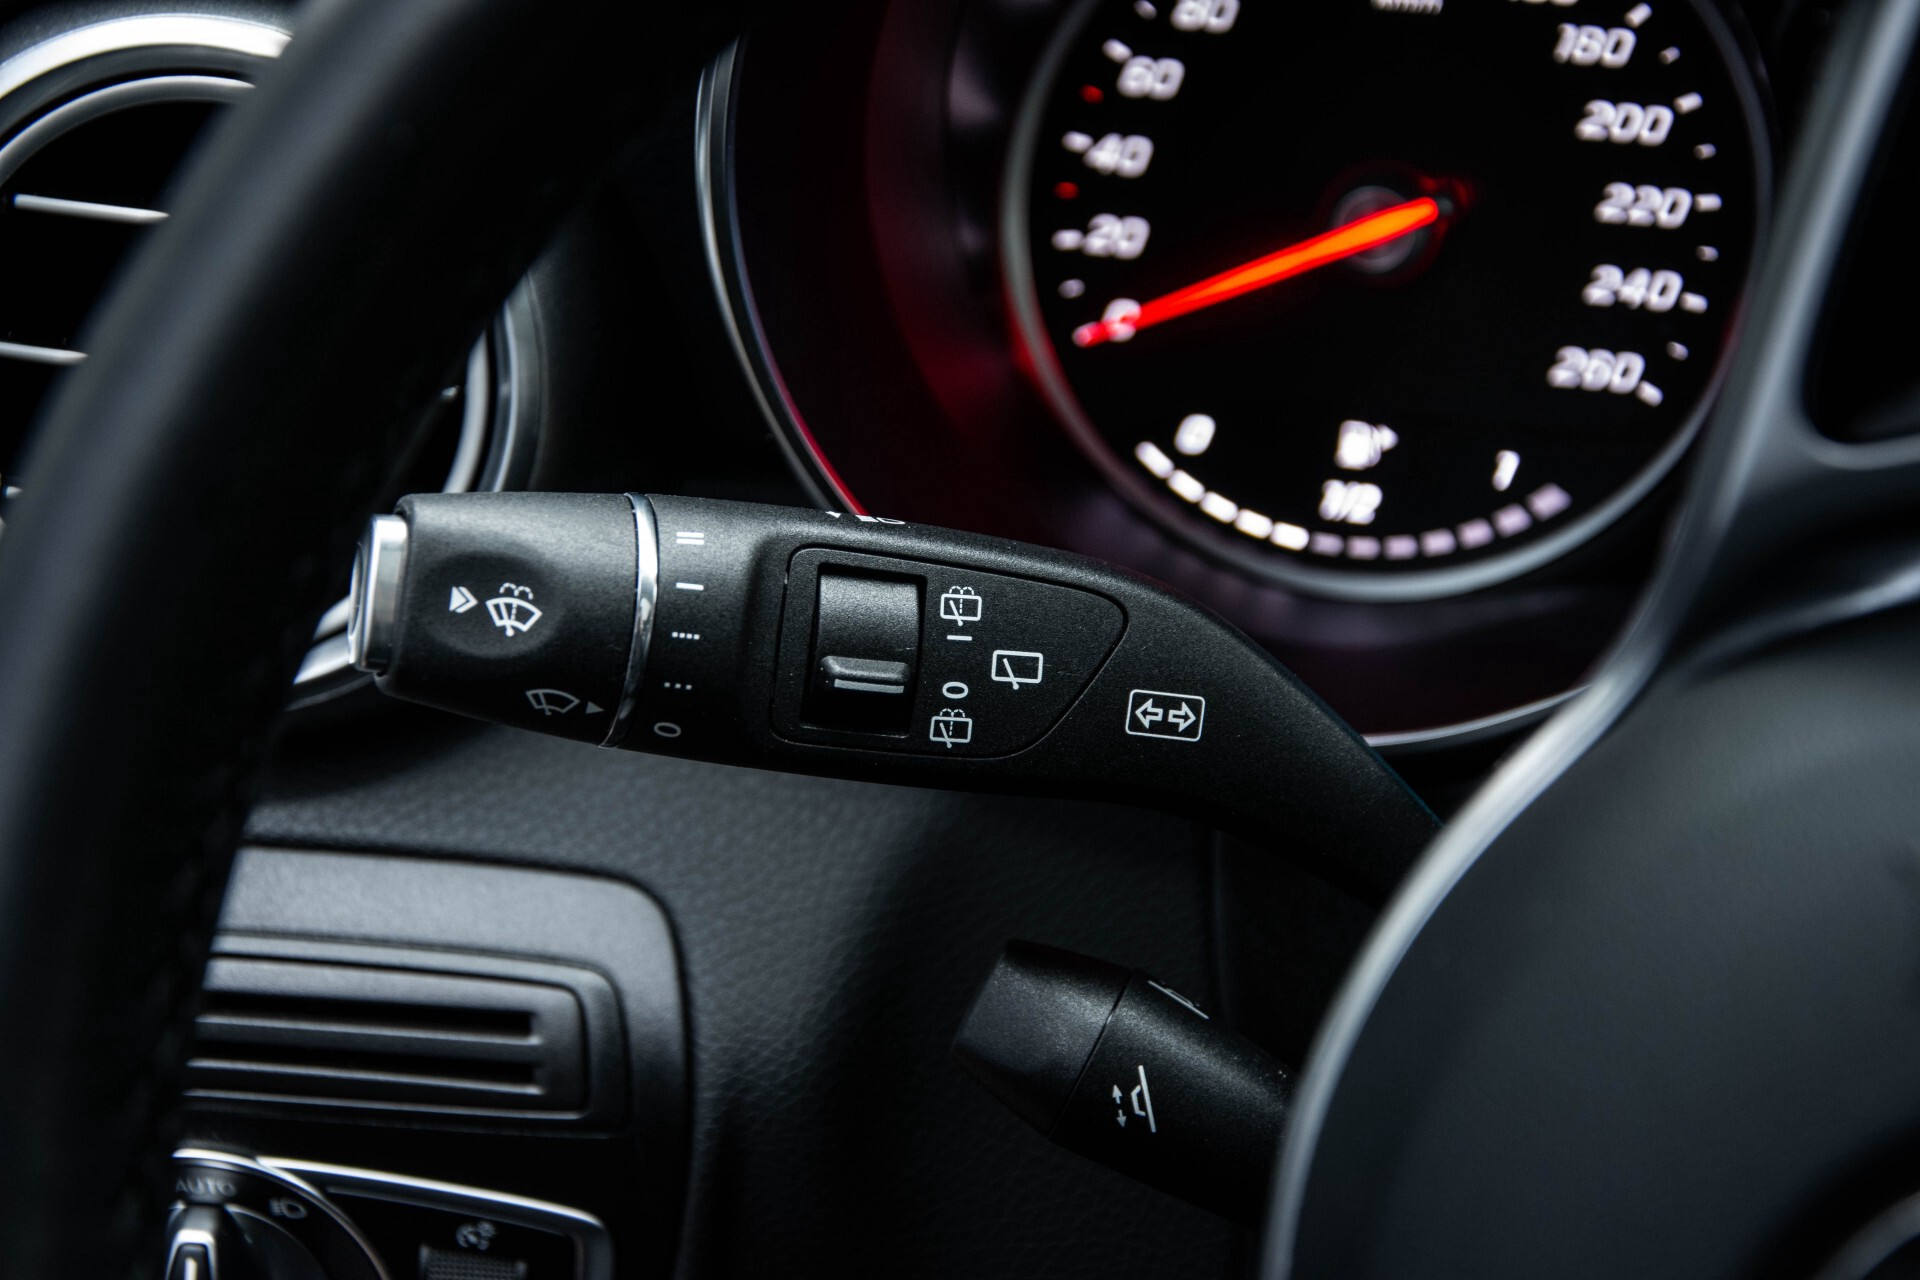 Mercedes-Benz GLC 200 4-M AMG Night/Panorama/Distronic Pro/Burmester/360camera/Exclusive Aut9 Foto 10